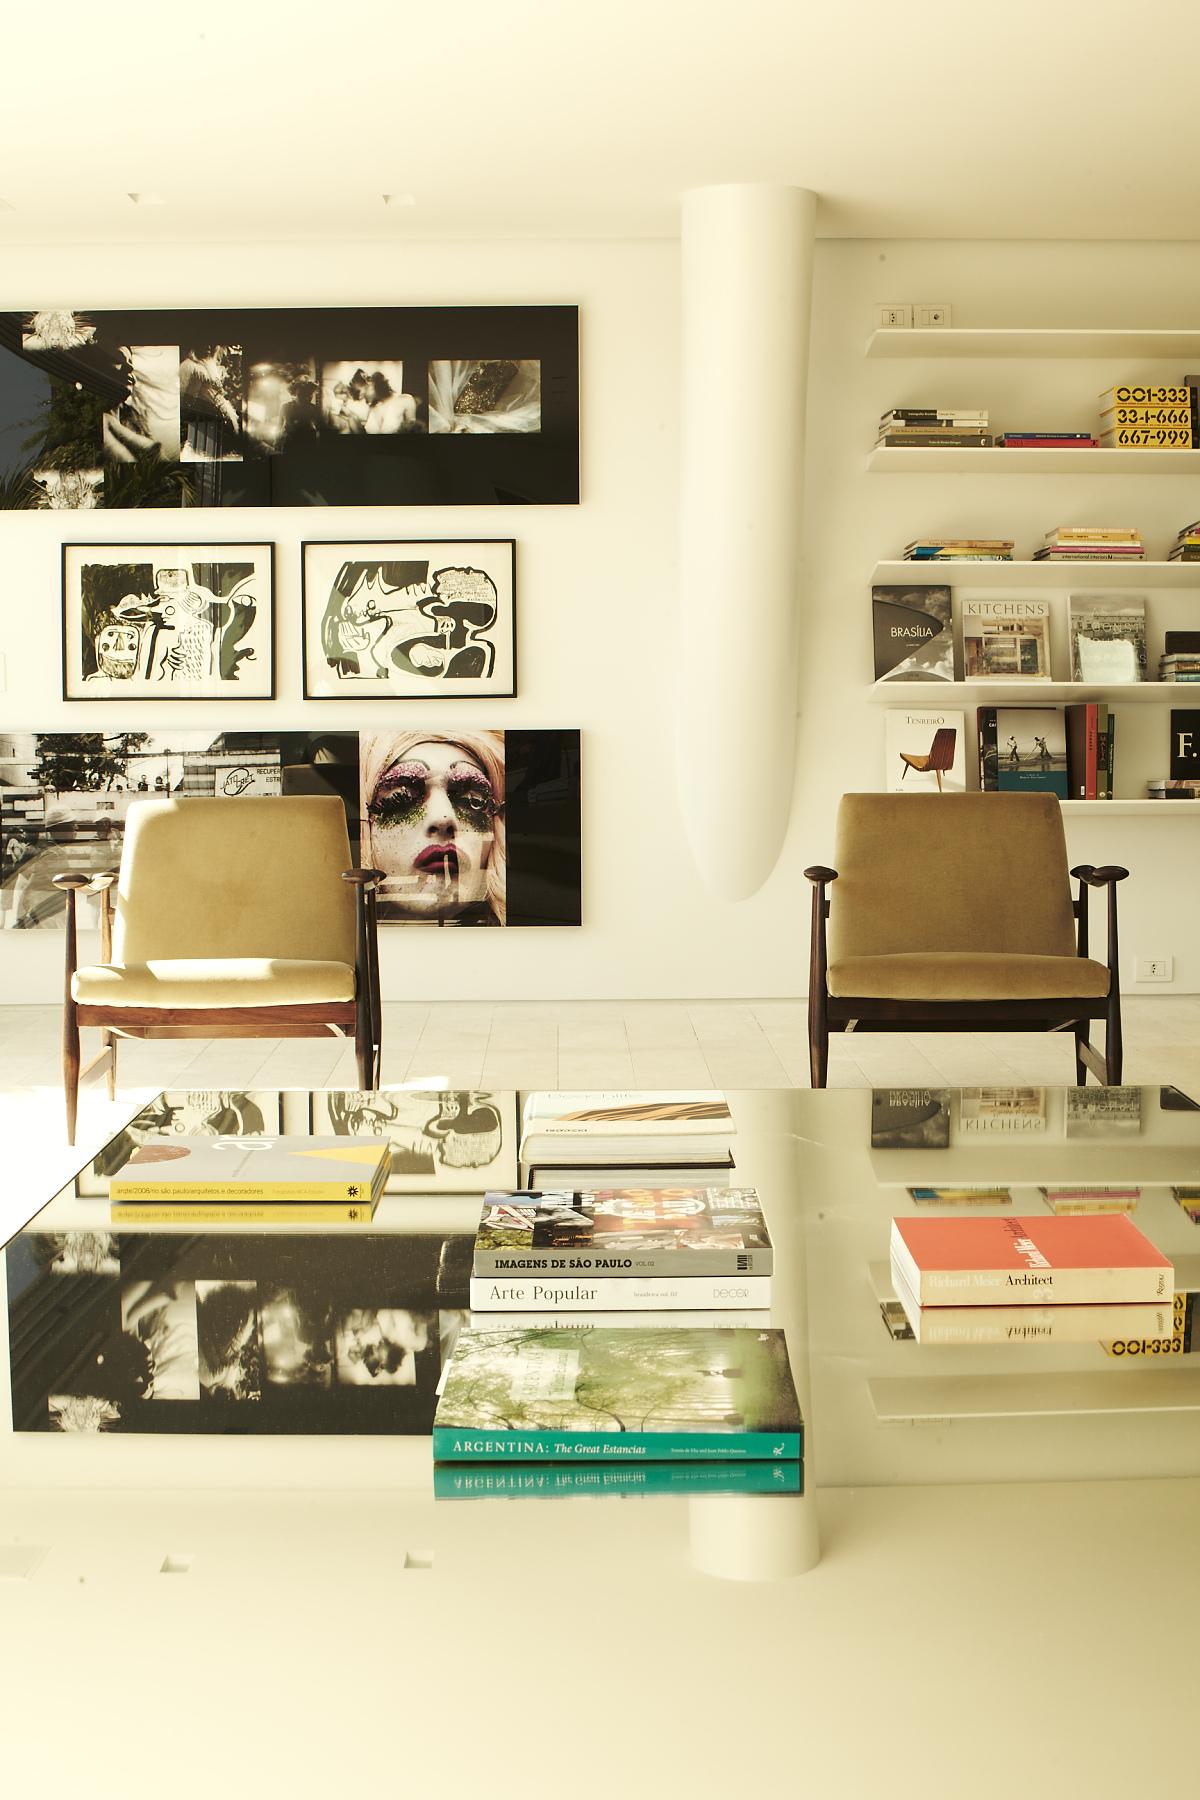 04-2012-os-apartamentos-vencedores-do-premio-casa-claudia-design-de-interiores